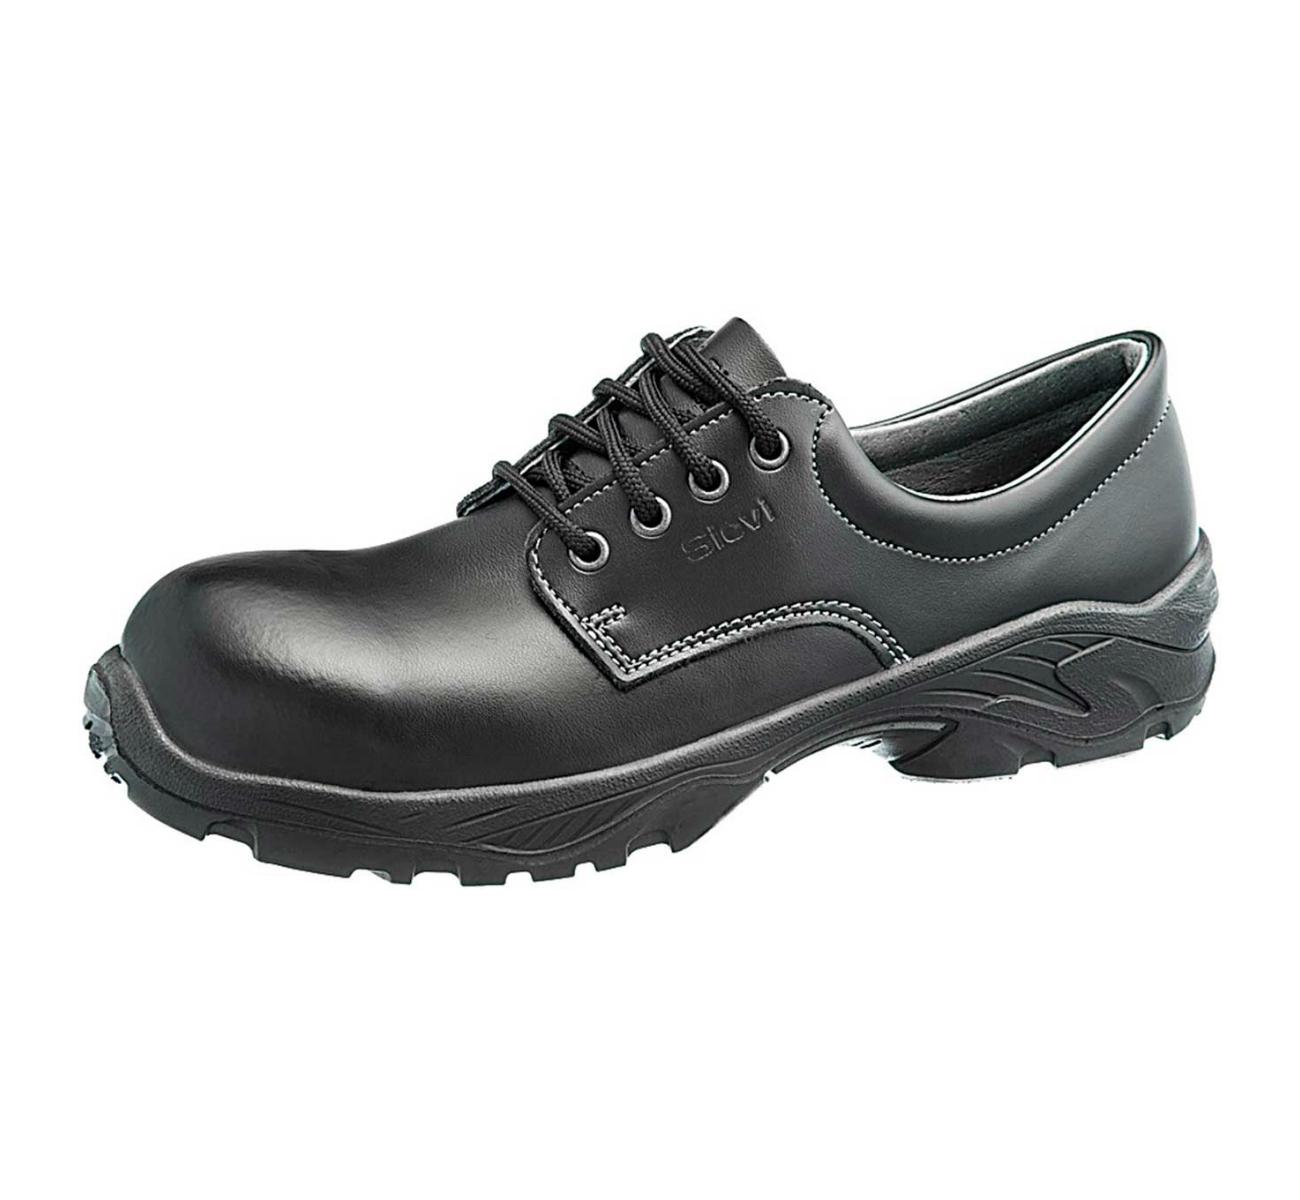 Esd Composite Toe Shoes